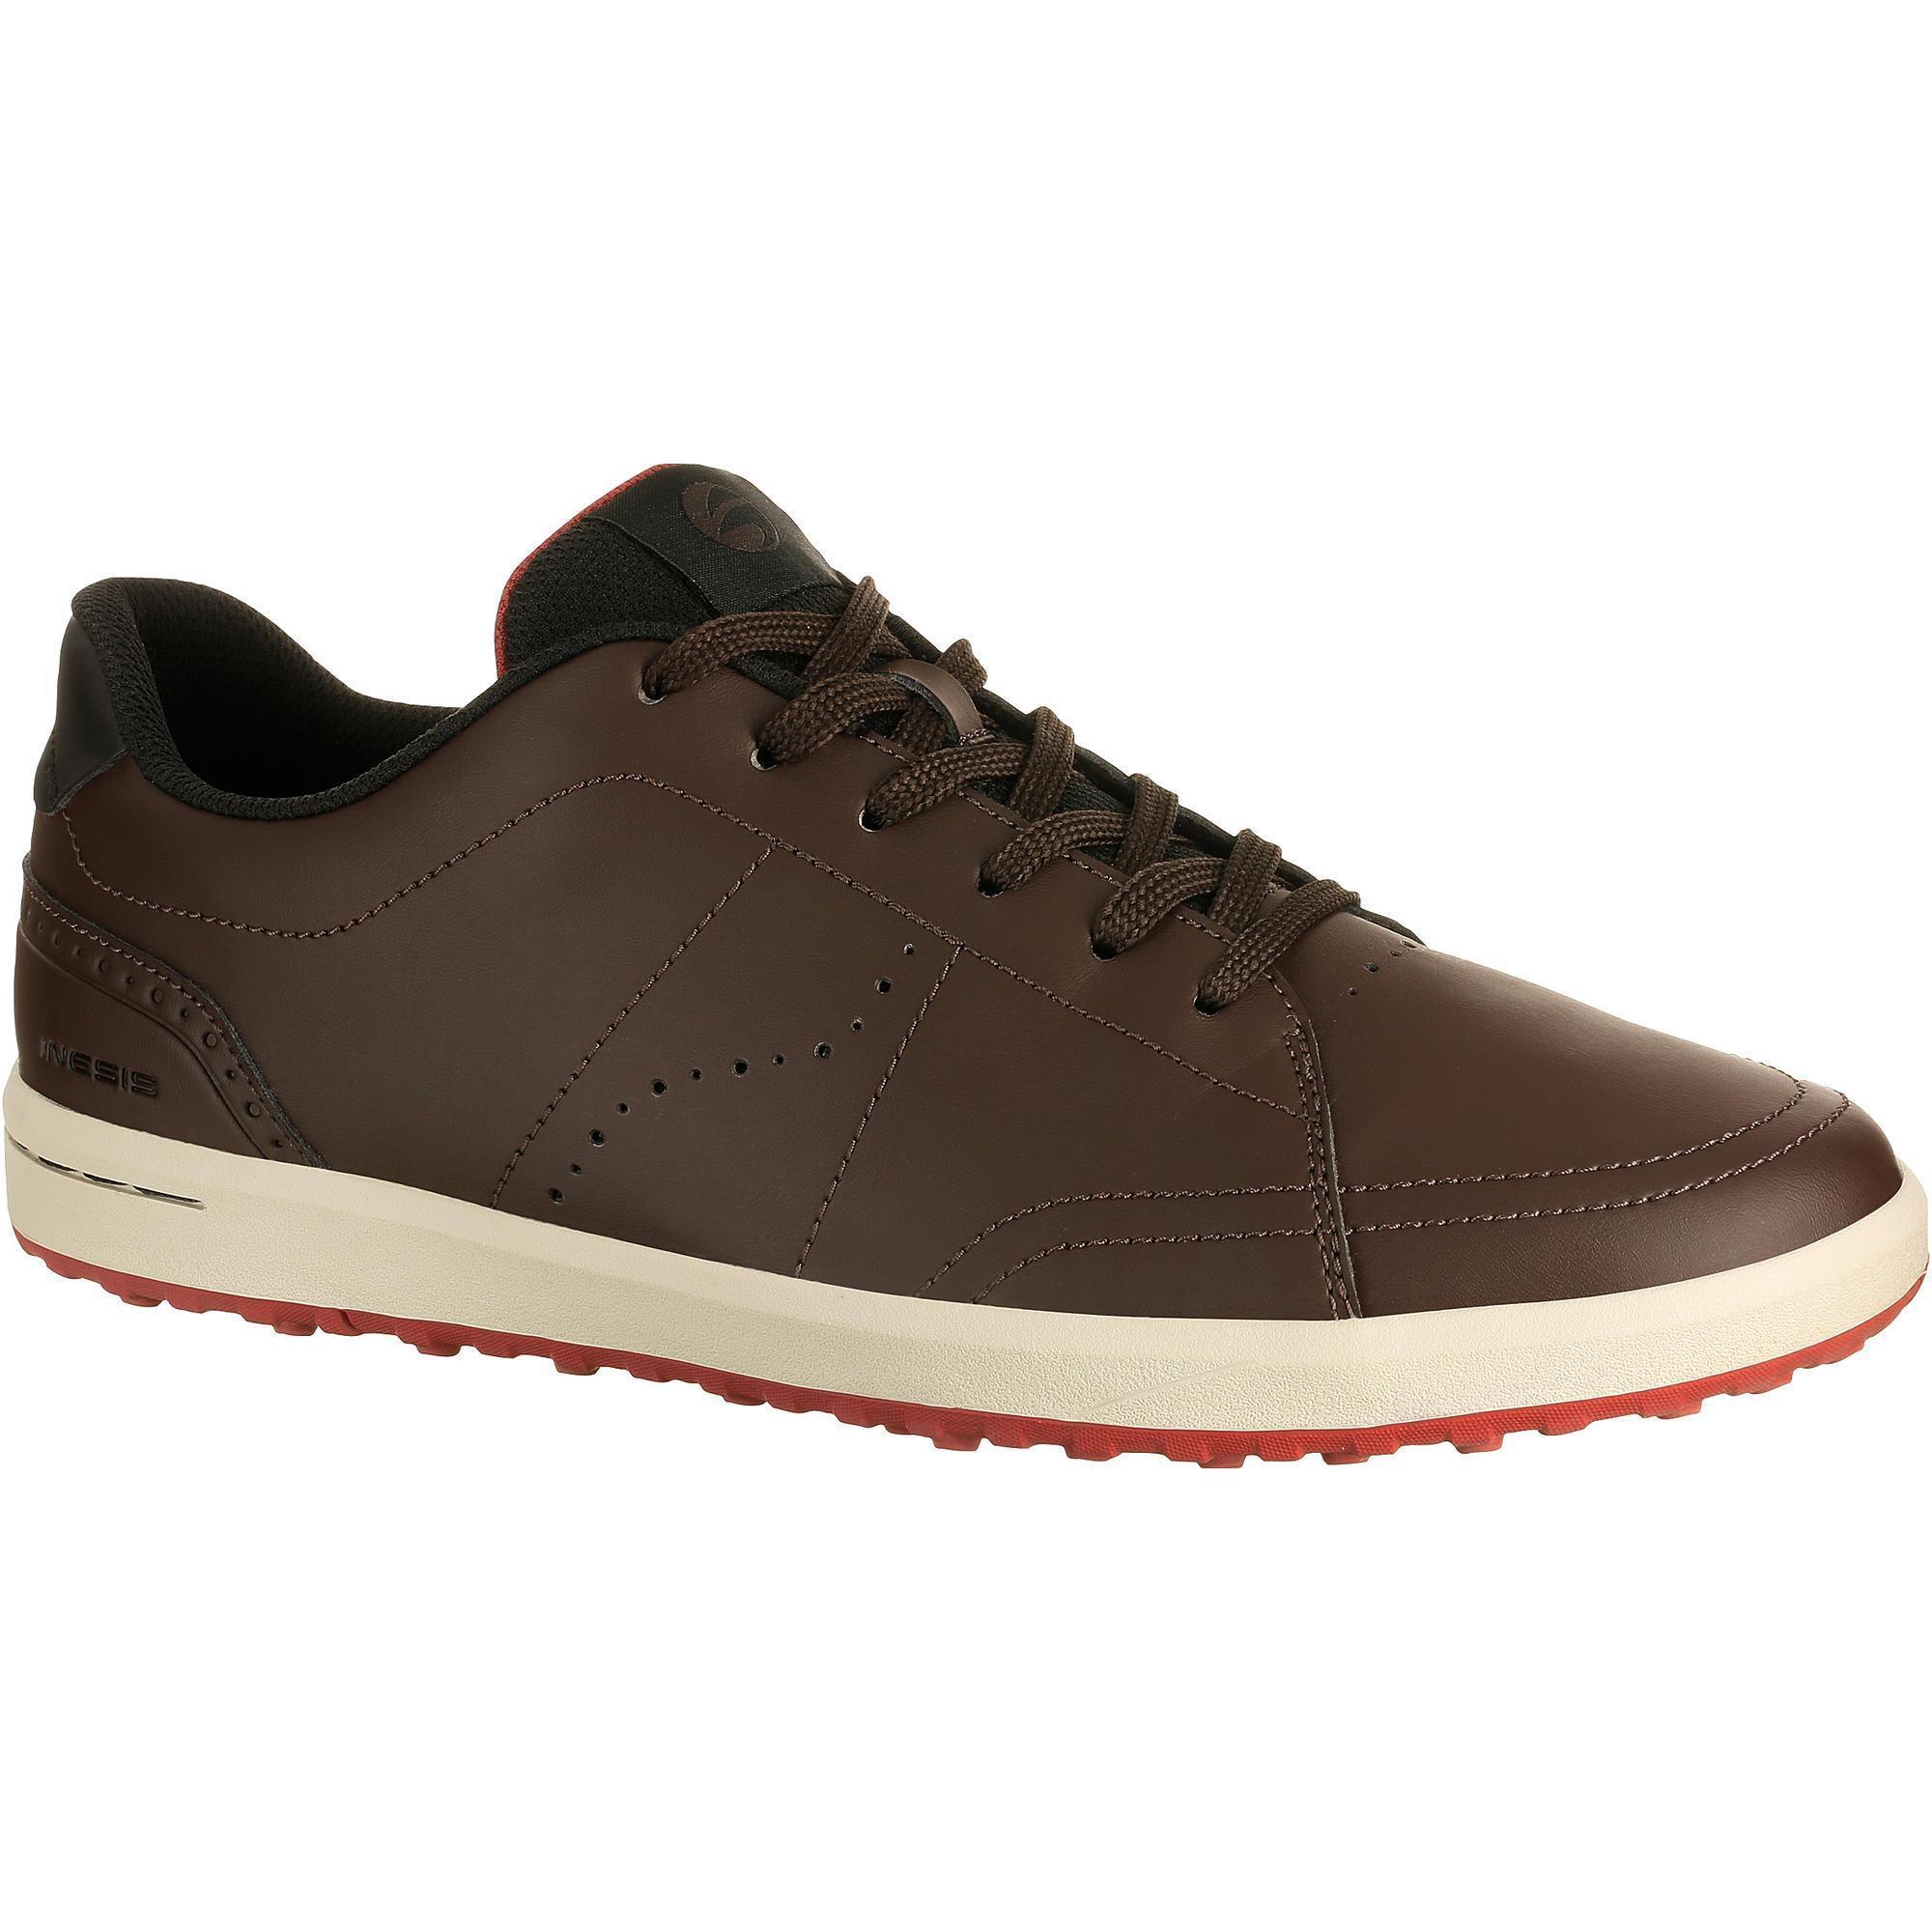 chaussures golf homme spikeless 100 marron inesis golf. Black Bedroom Furniture Sets. Home Design Ideas